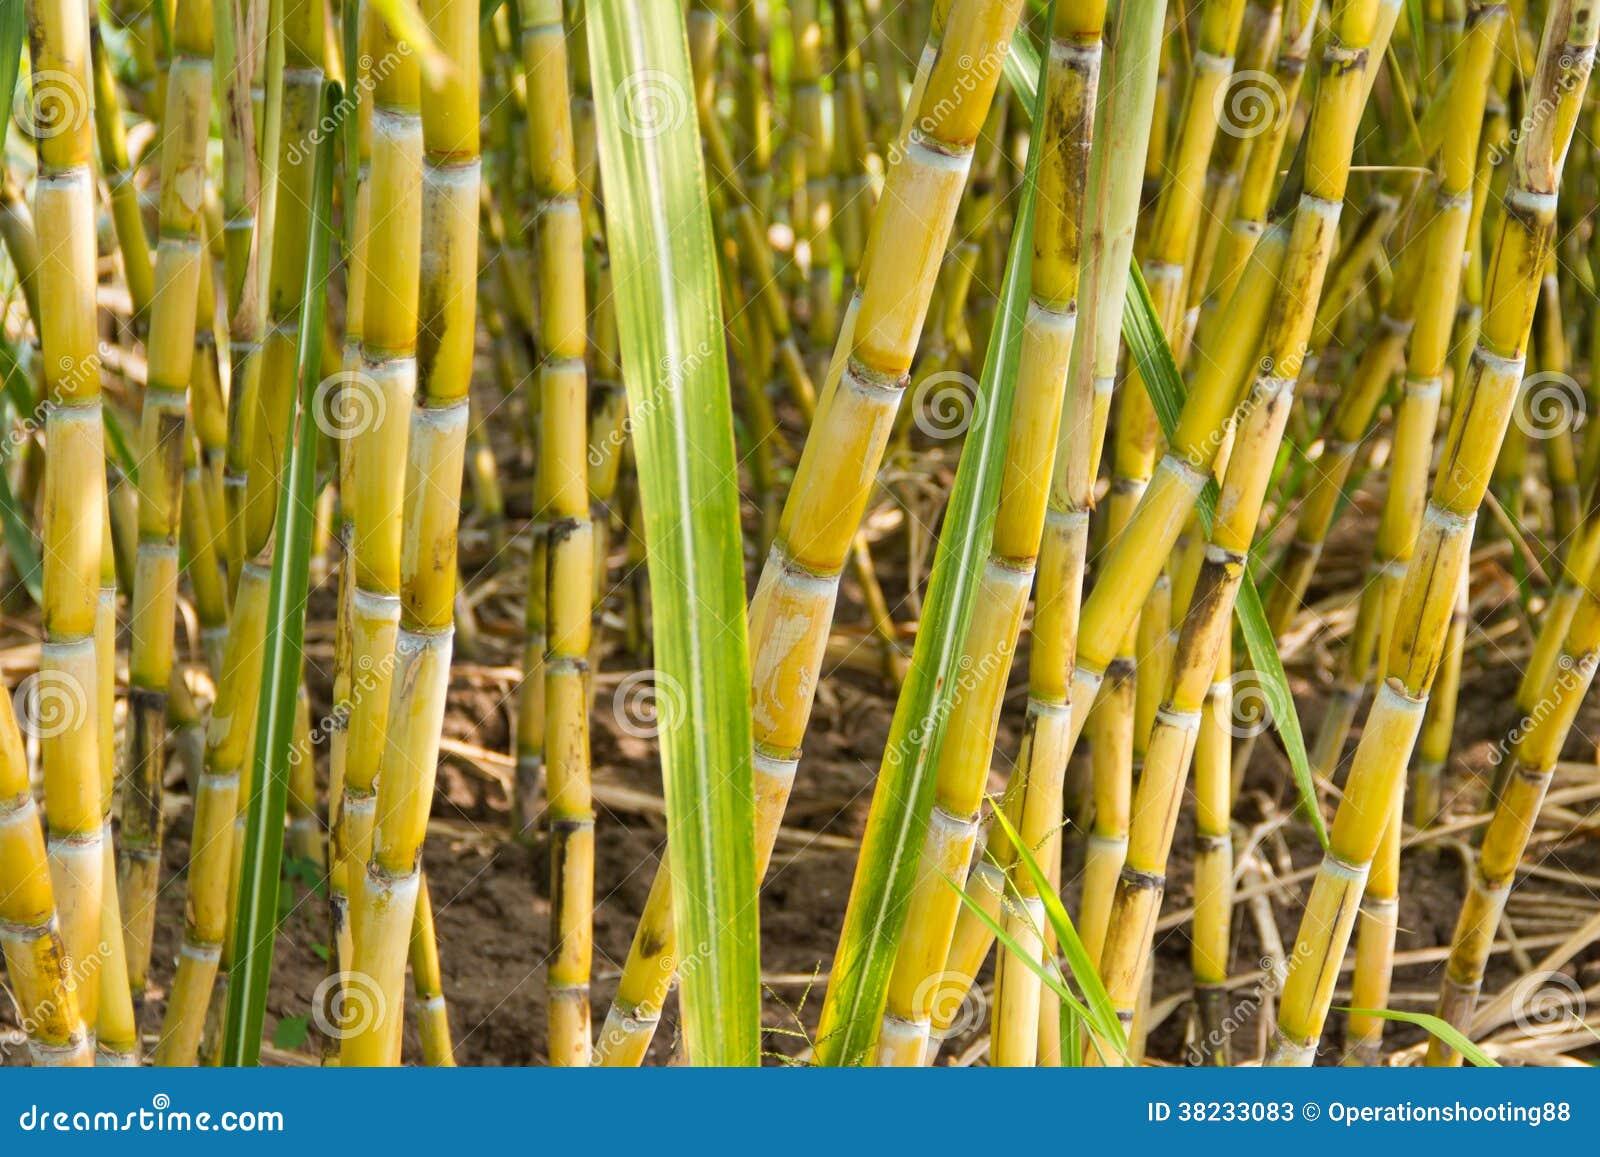 Sugarcane Plants Stock Image. Image Of Fresh, Field, Crop